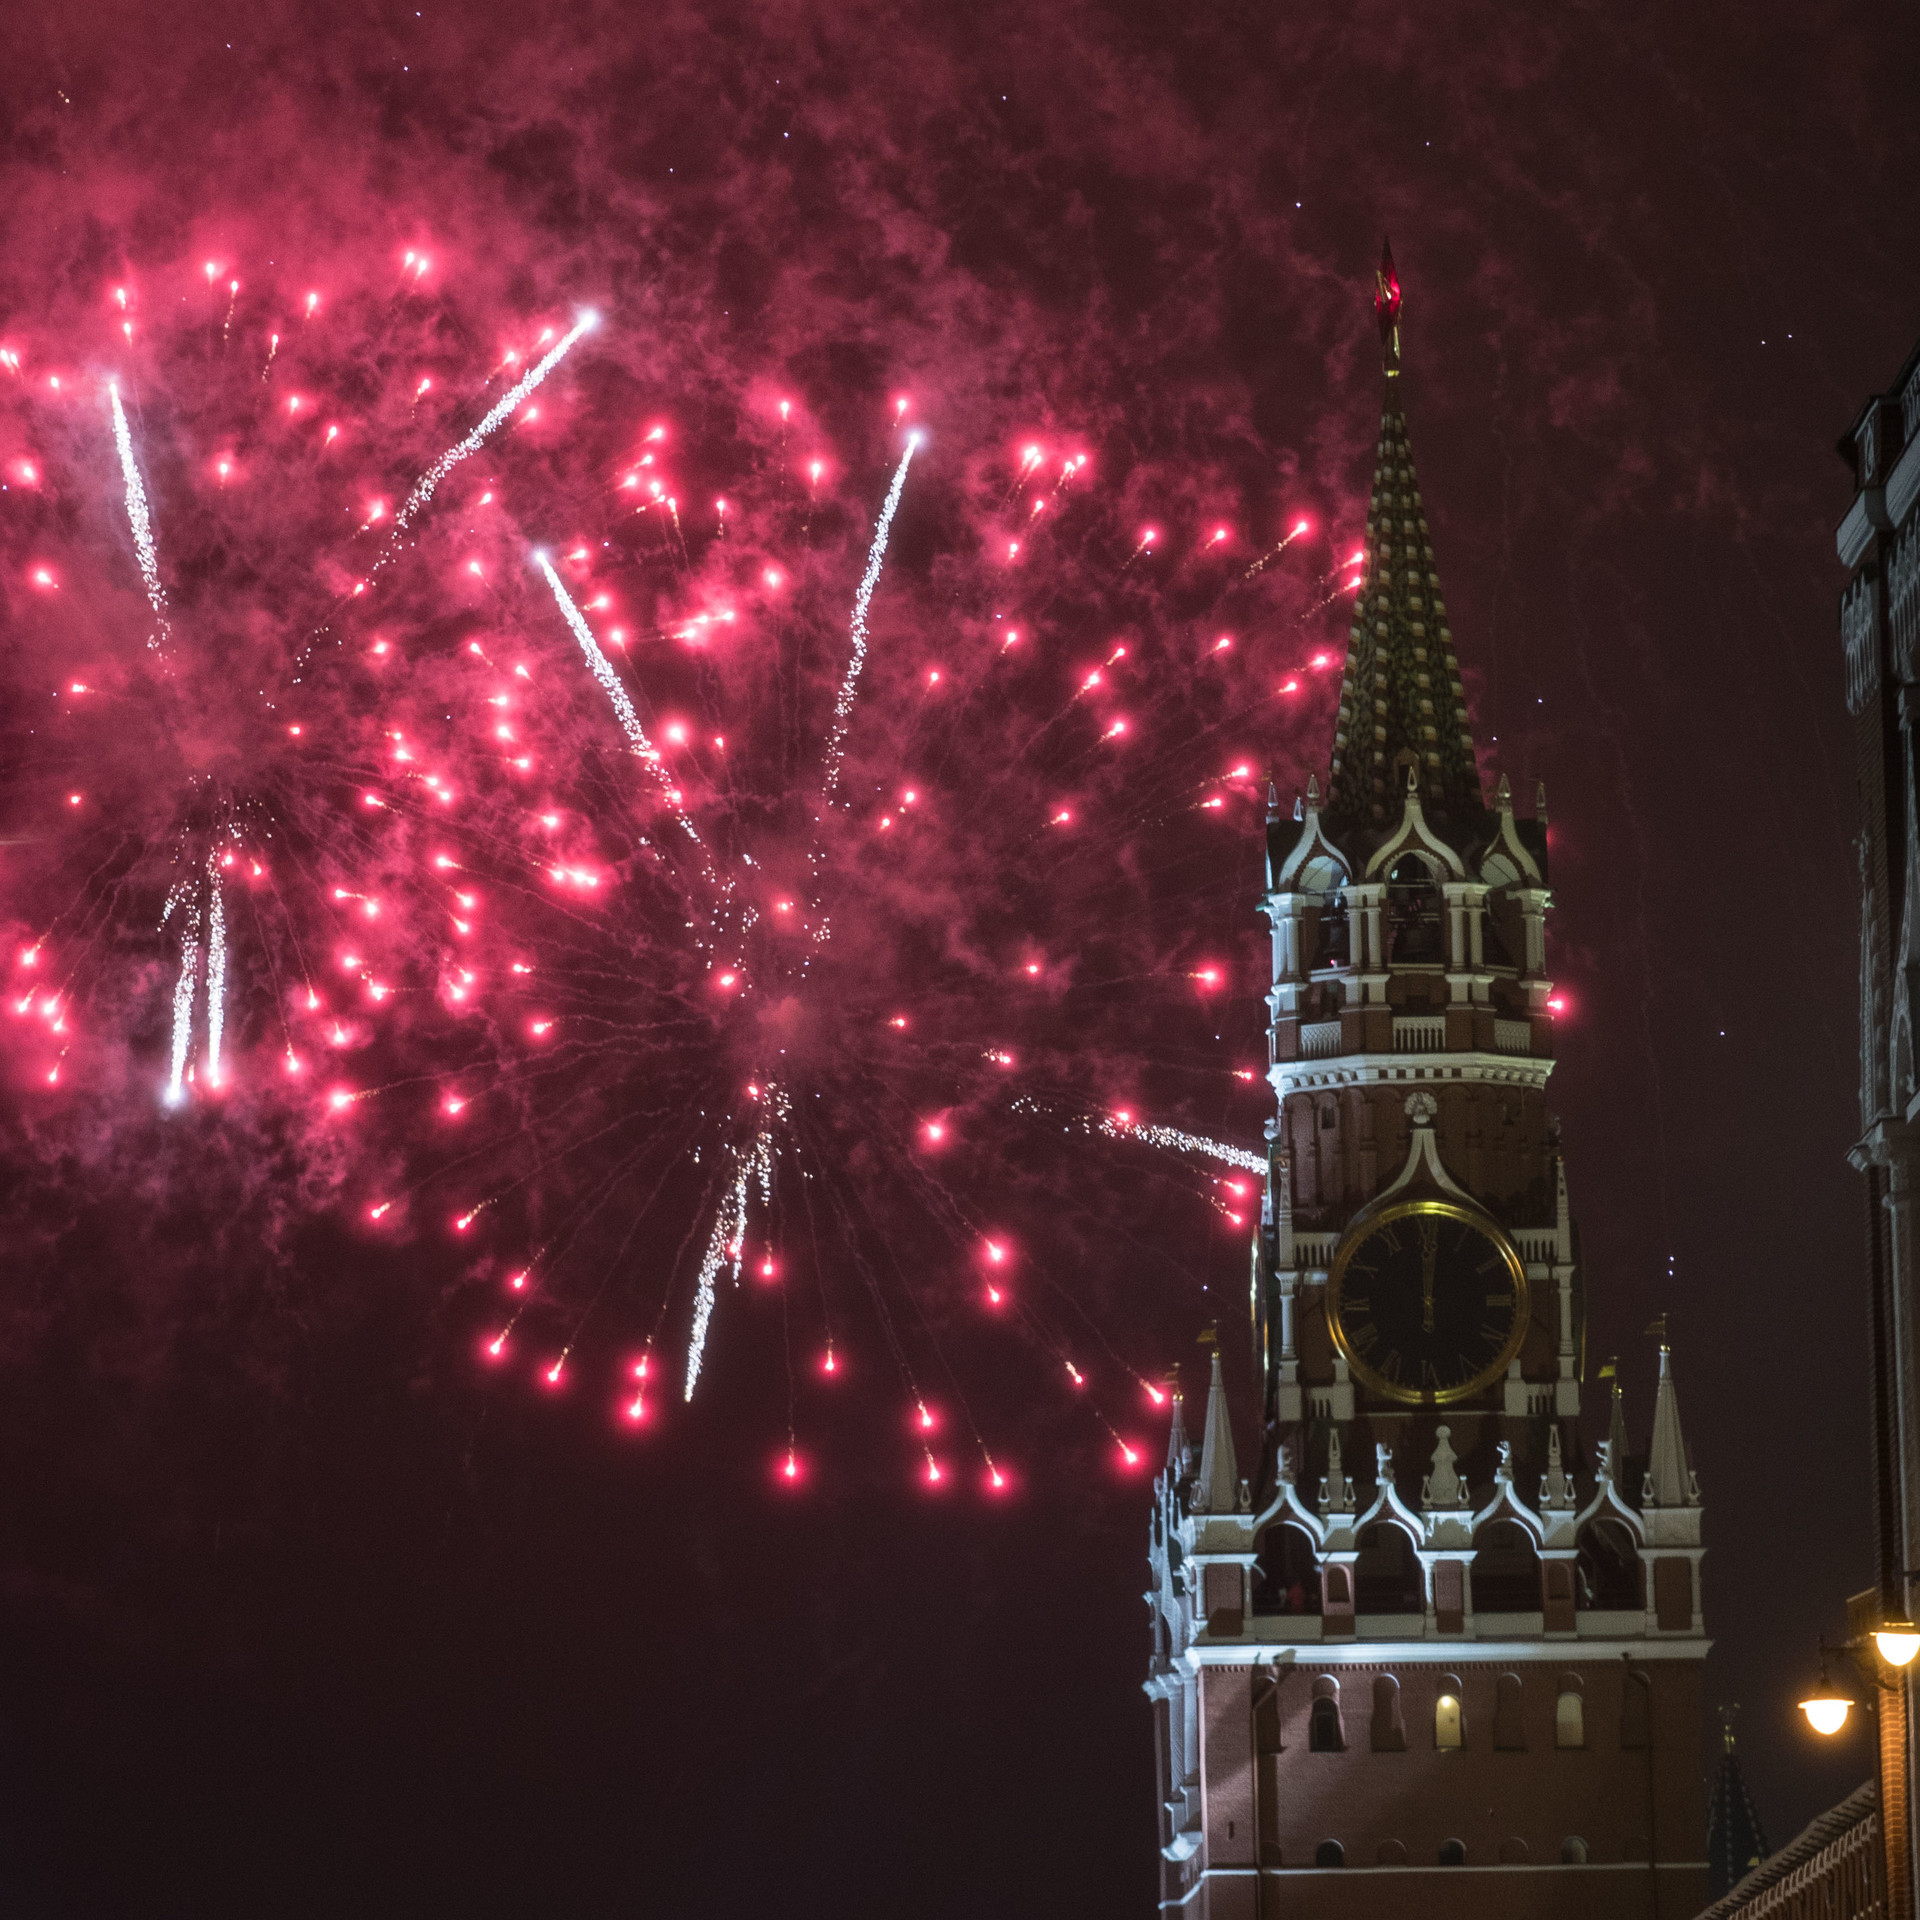 Novoletni ognjemet nad Kremljem, Moskva